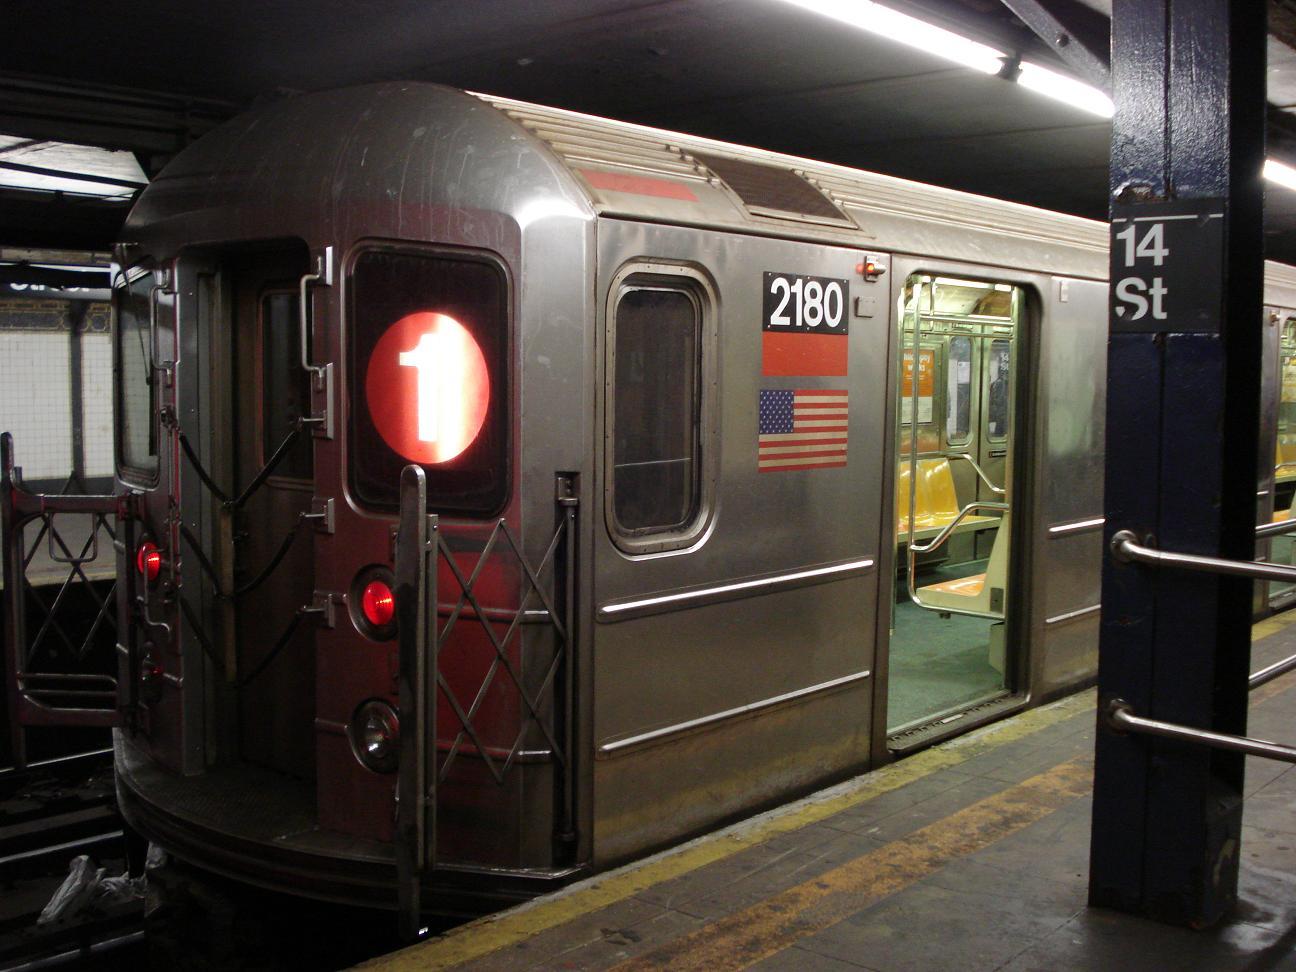 (163k, 1296x972)<br><b>Country:</b> United States<br><b>City:</b> New York<br><b>System:</b> New York City Transit<br><b>Line:</b> IRT West Side Line<br><b>Location:</b> 14th Street <br><b>Route:</b> 1<br><b>Car:</b> R-62A (Bombardier, 1984-1987)  2180 <br><b>Photo by:</b> Michael Hodurski<br><b>Date:</b> 2/17/2007<br><b>Viewed (this week/total):</b> 7 / 3019